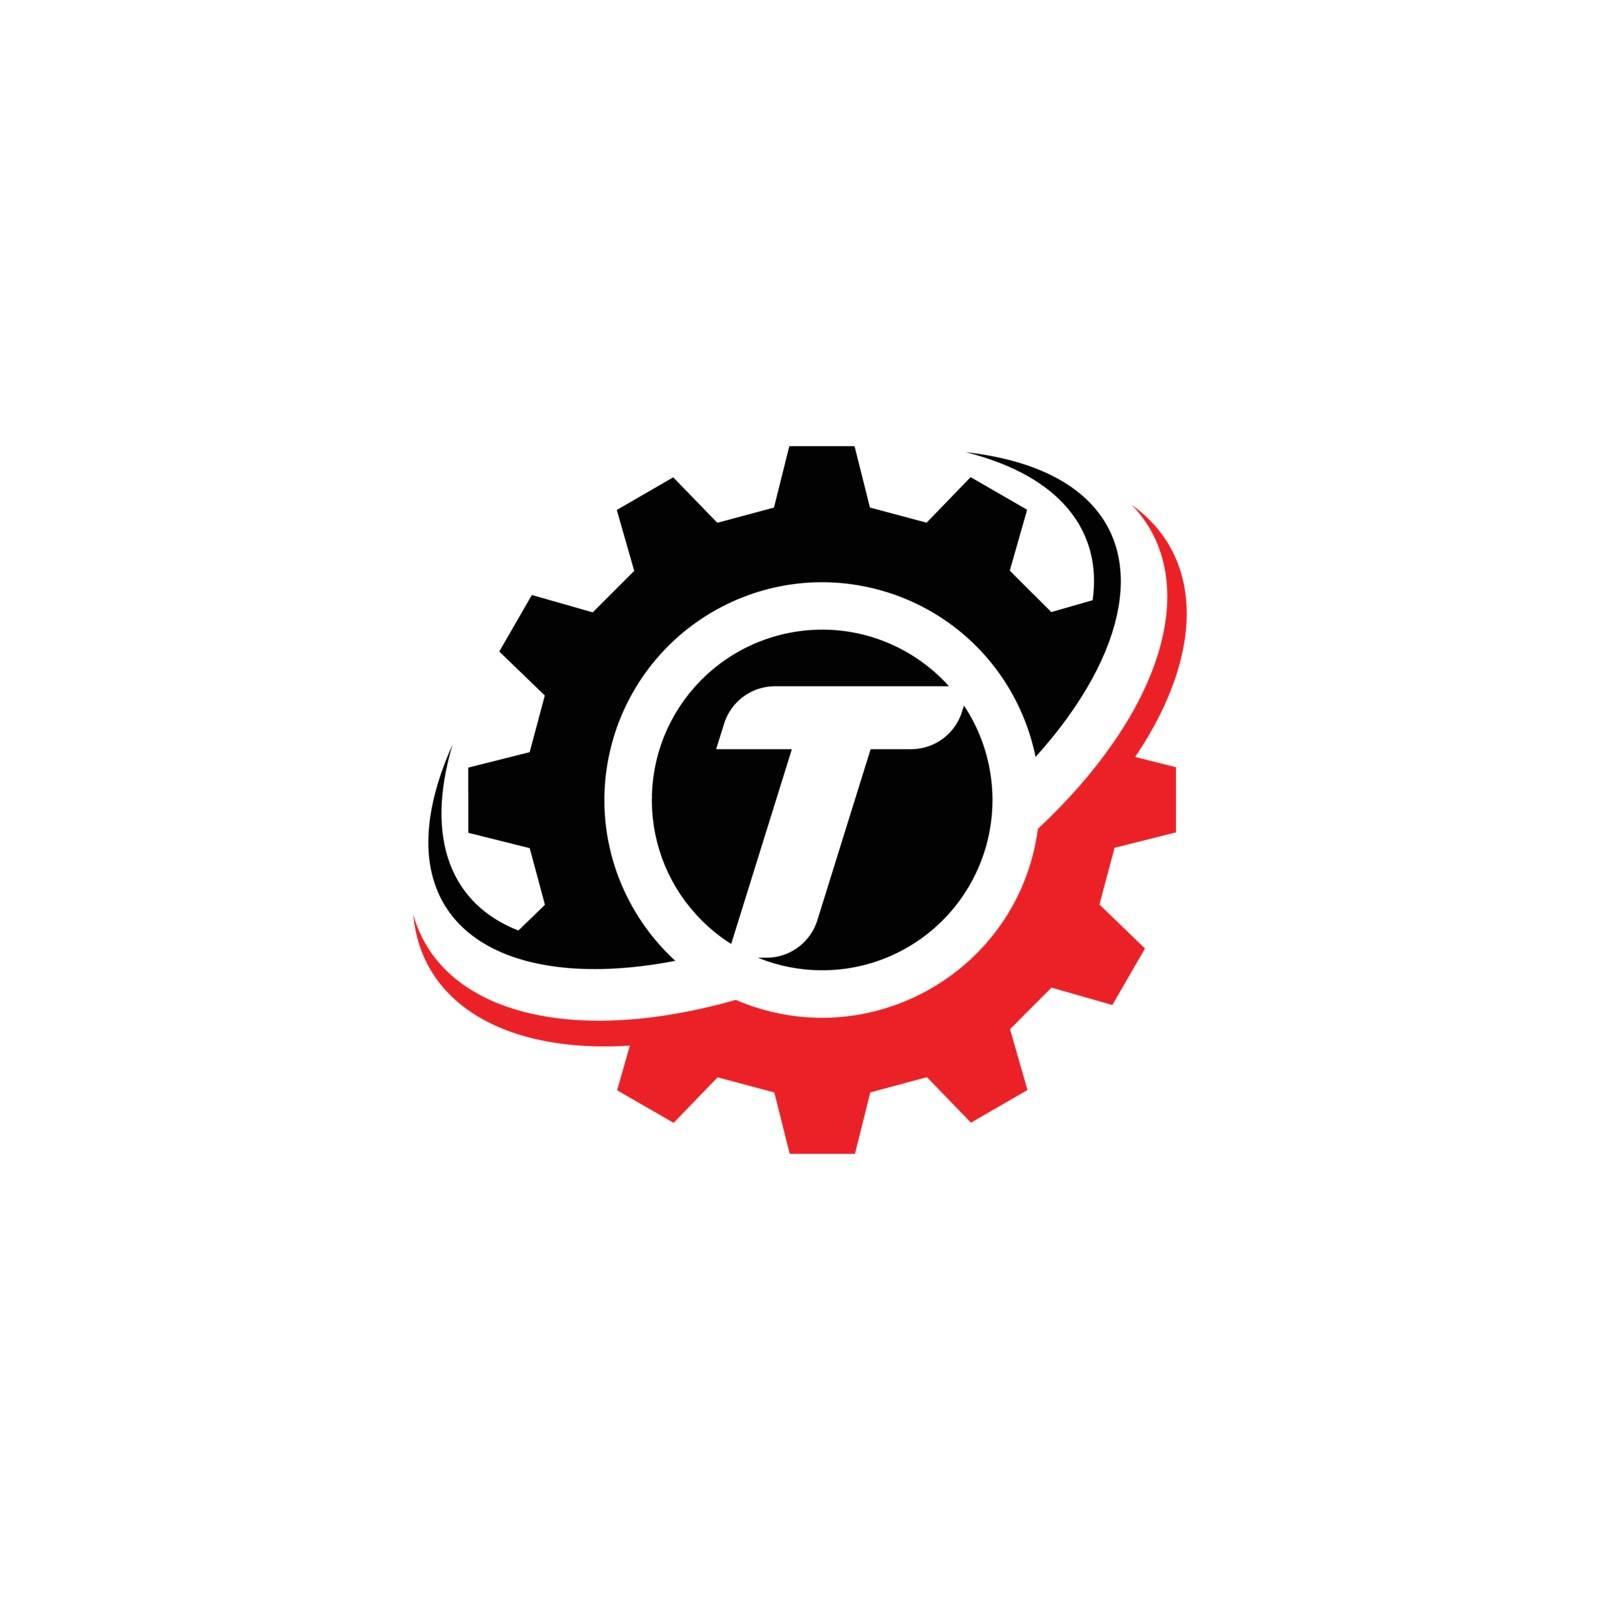 Letter T Gear Logo Design Template